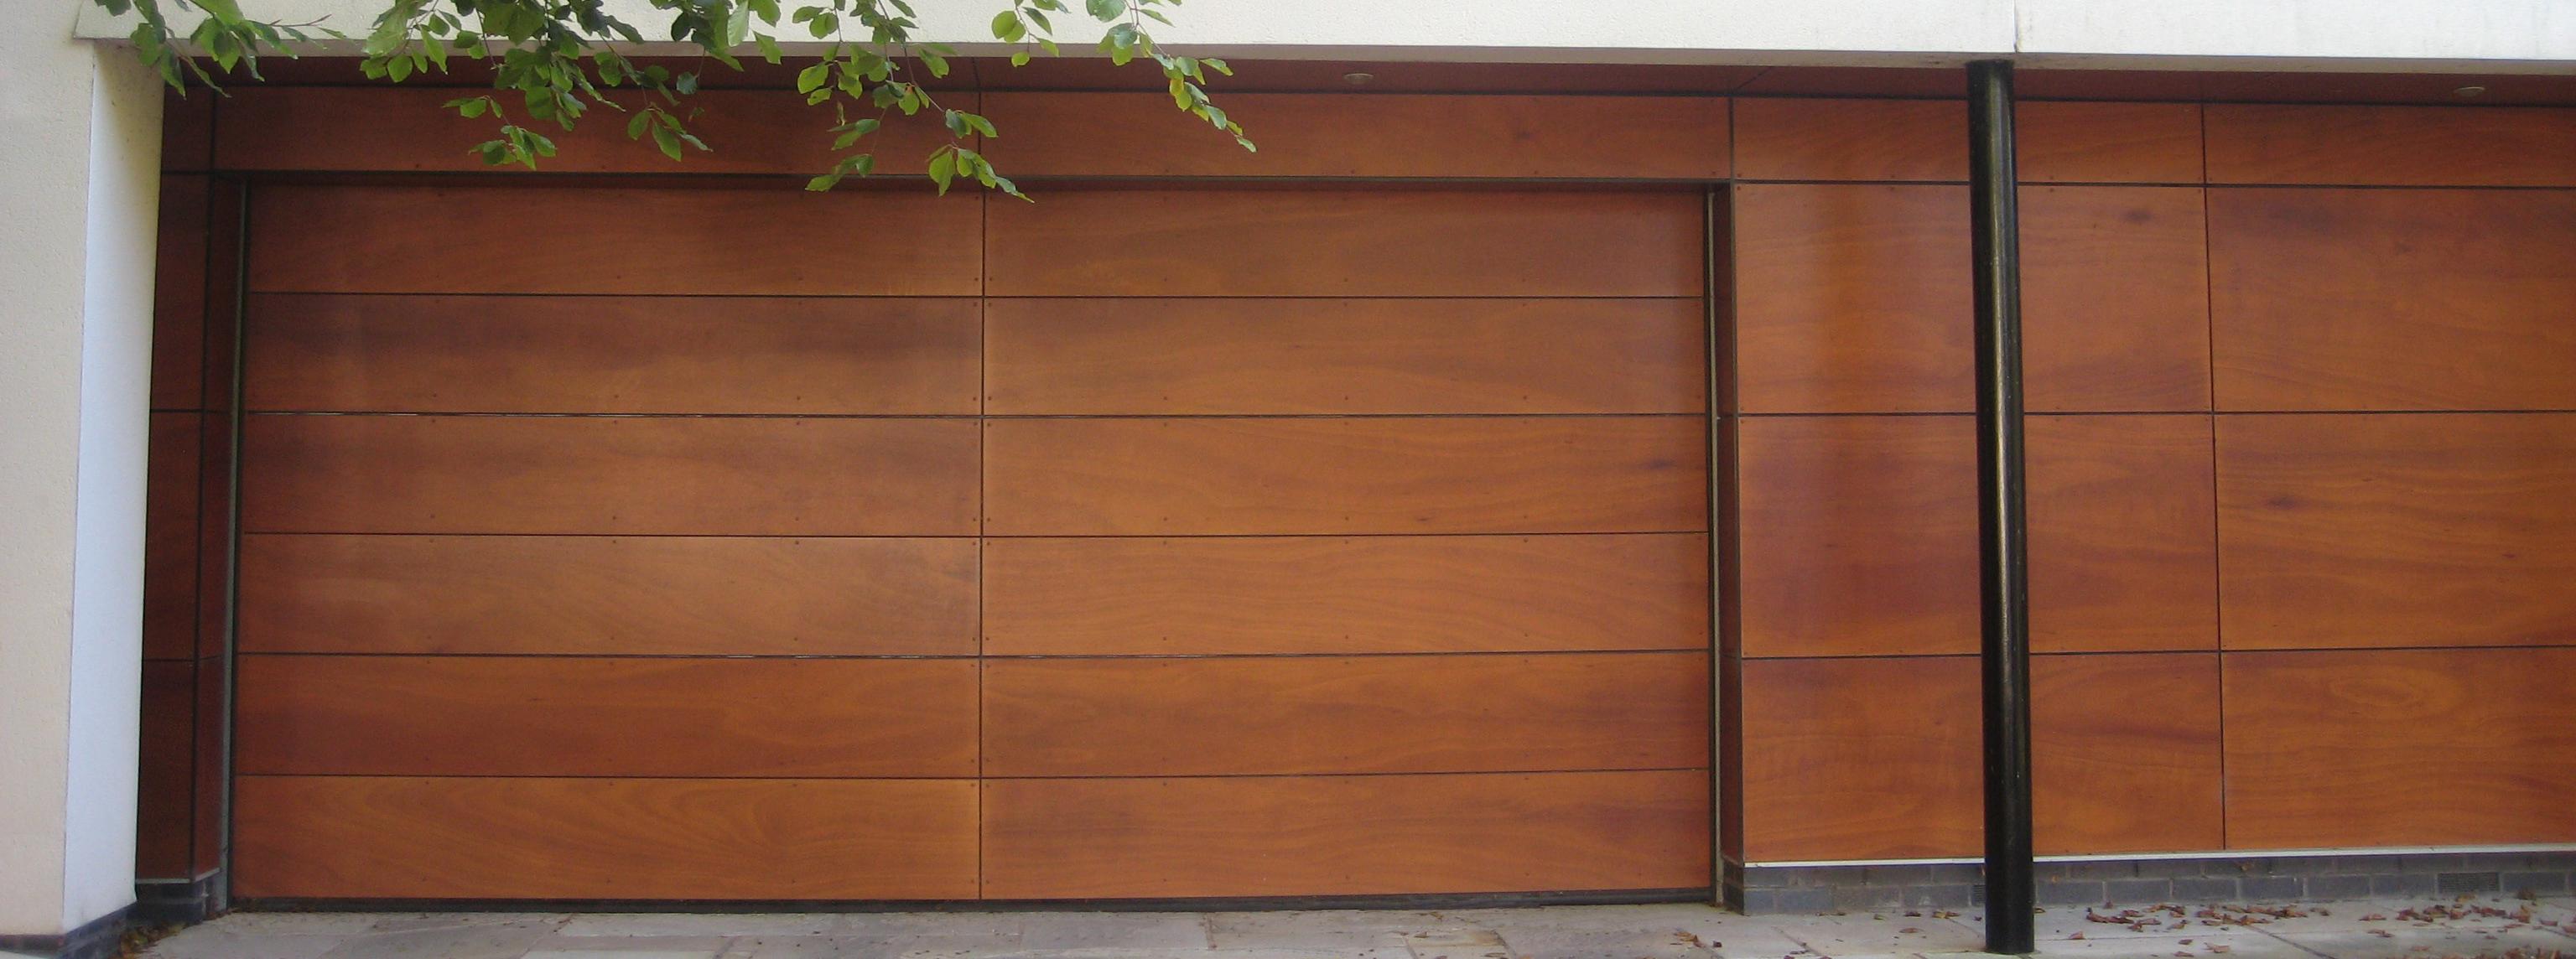 Sistemas automatizados para puertas de garaje puertas de - Puertas abatibles garaje ...